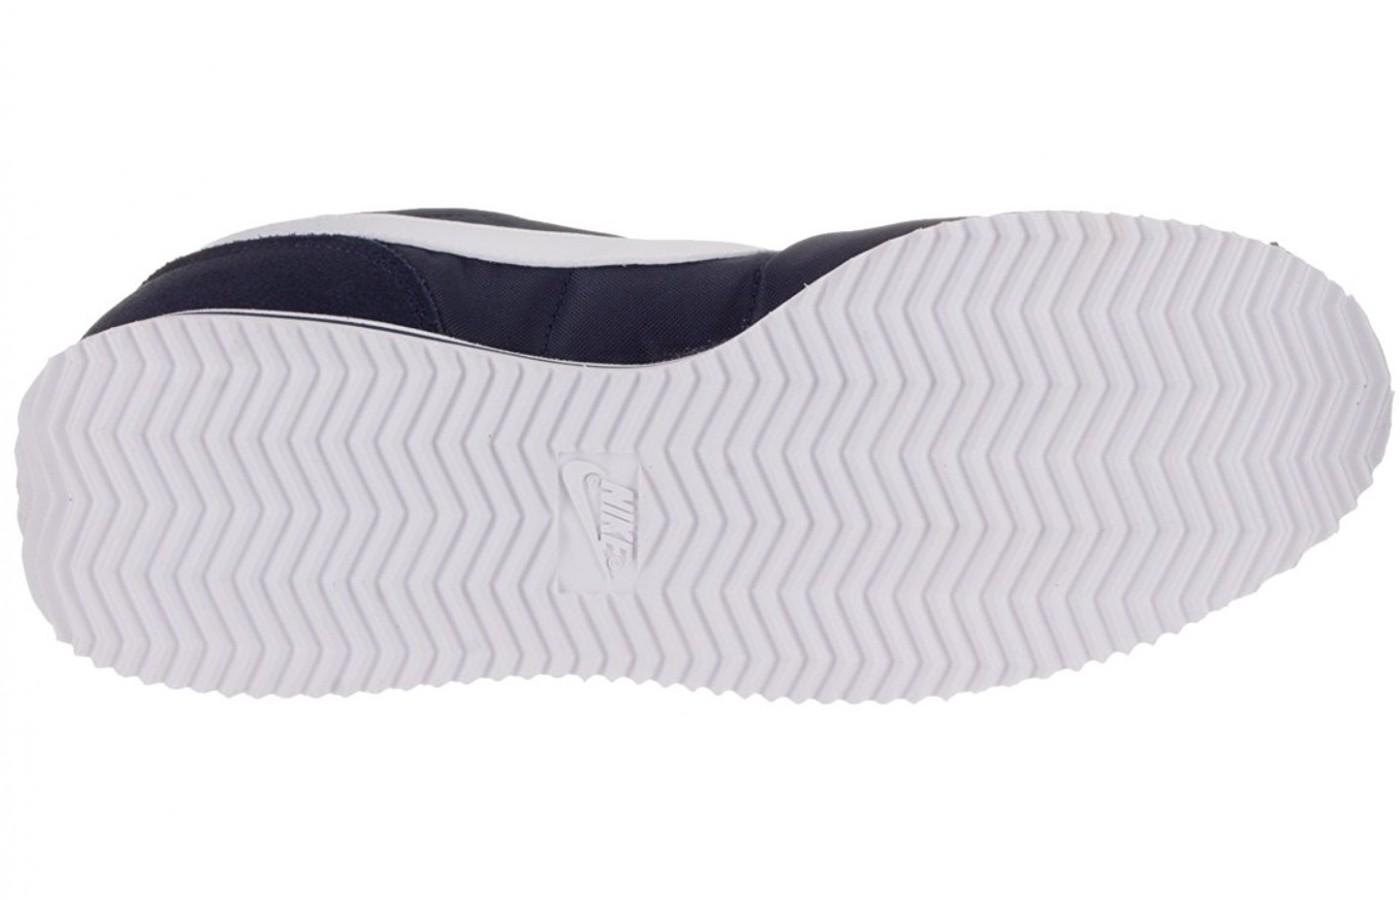 Full view of the Herringbone pattern on the Nike Cortez